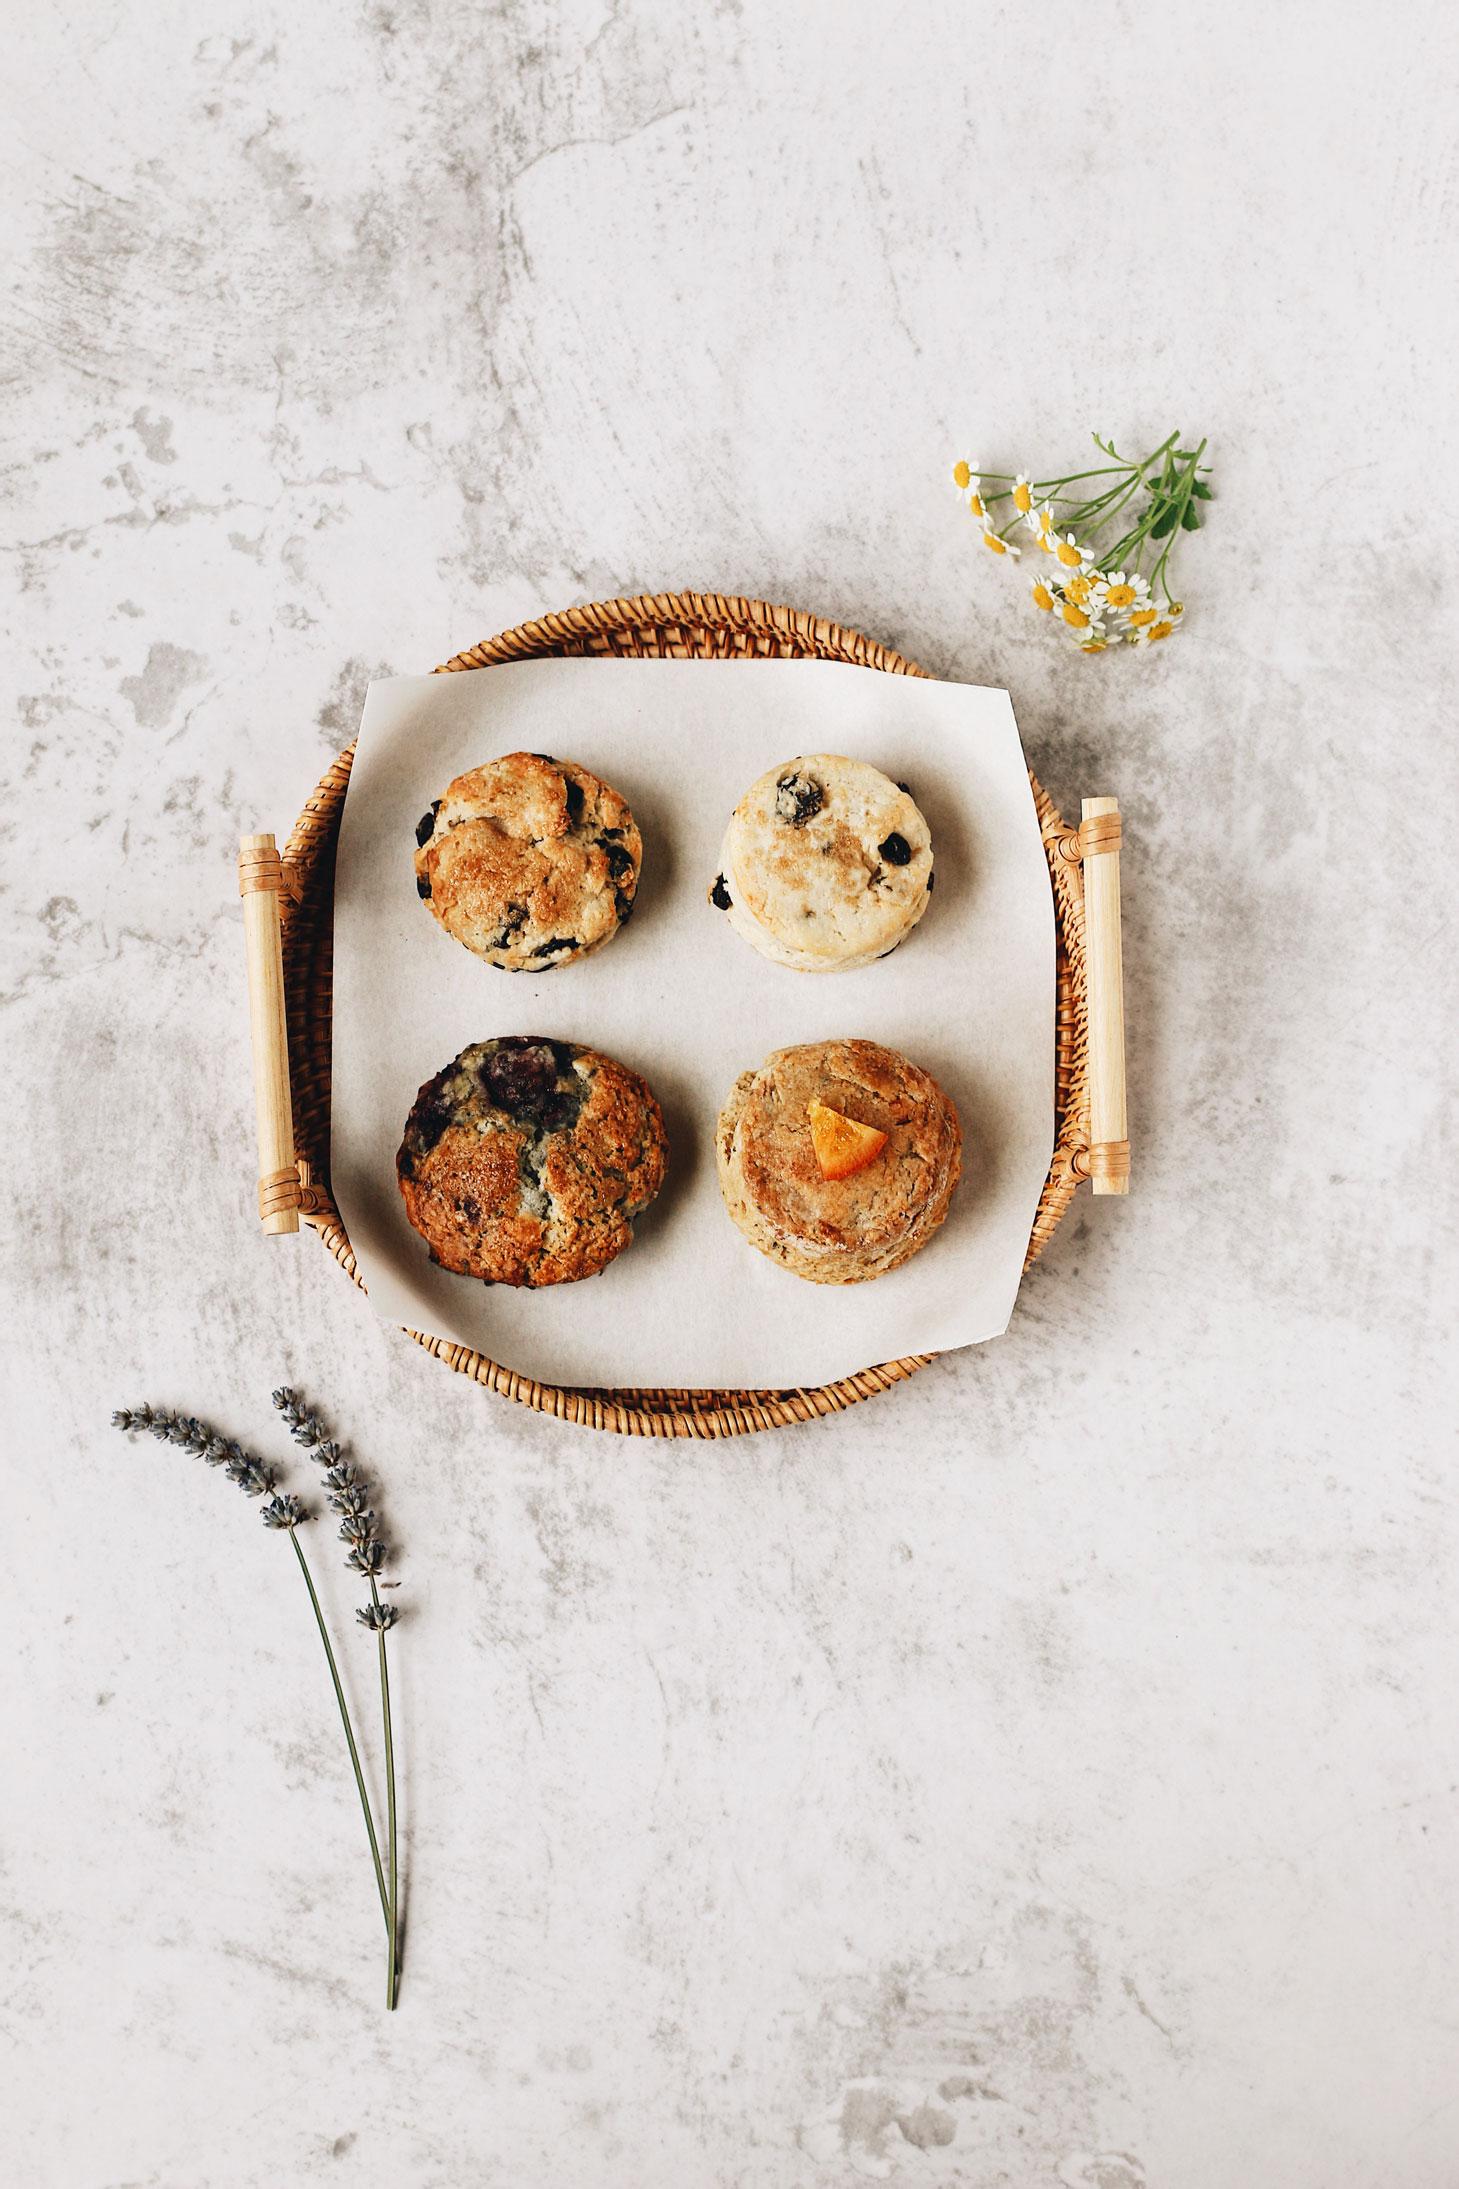 good-day-baking-co-mini-scone-sampler